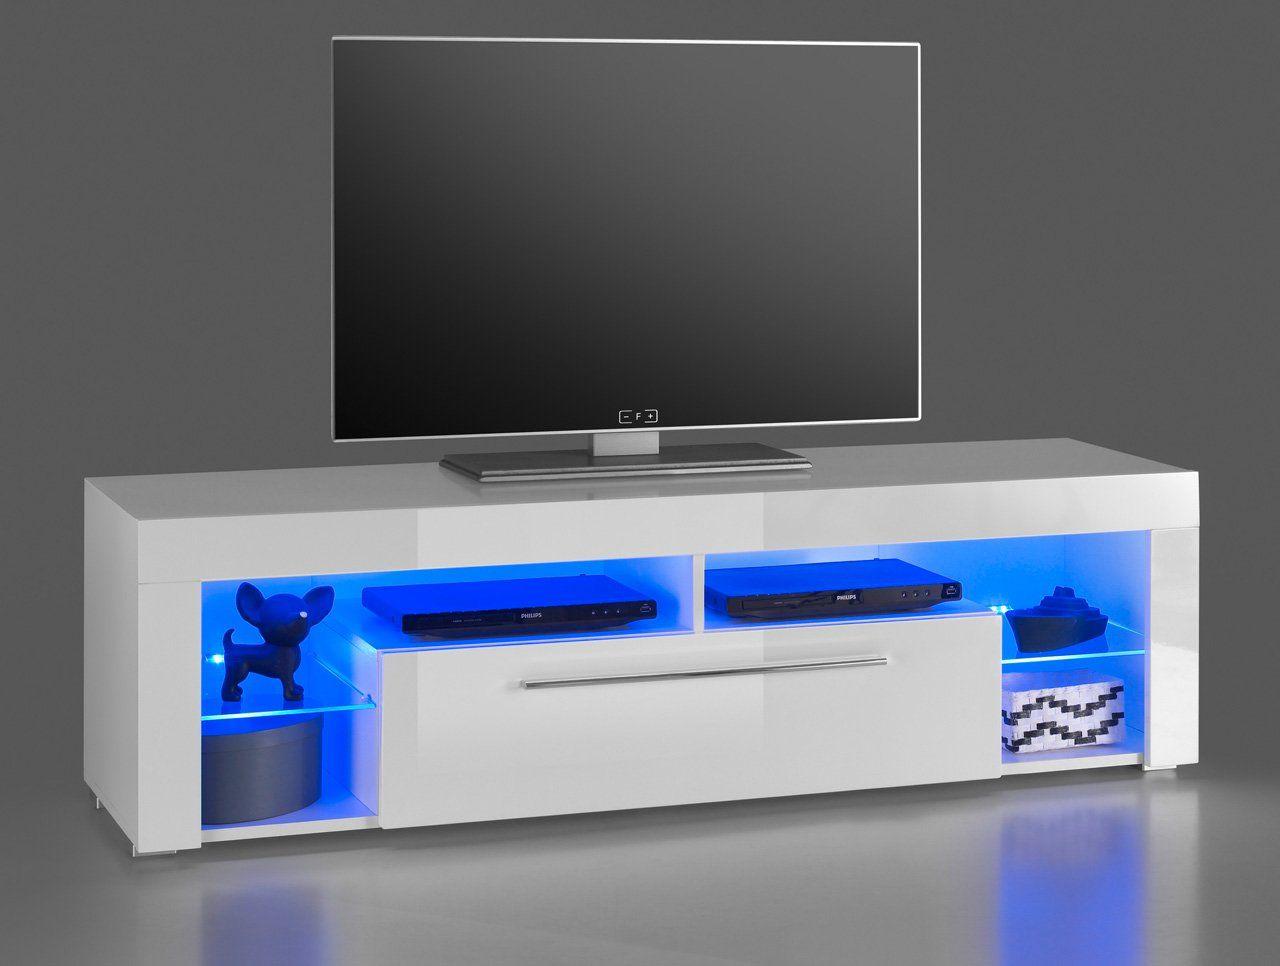 Lifestyle4living Lowboard Tv Schrank Tv Board Fernsehschrank Tv Sideboard Tv Unterschrank Tv Kommode Hochglanz Le In 2020 Tv Mobel Tv Unterschrank Tv Sideboard